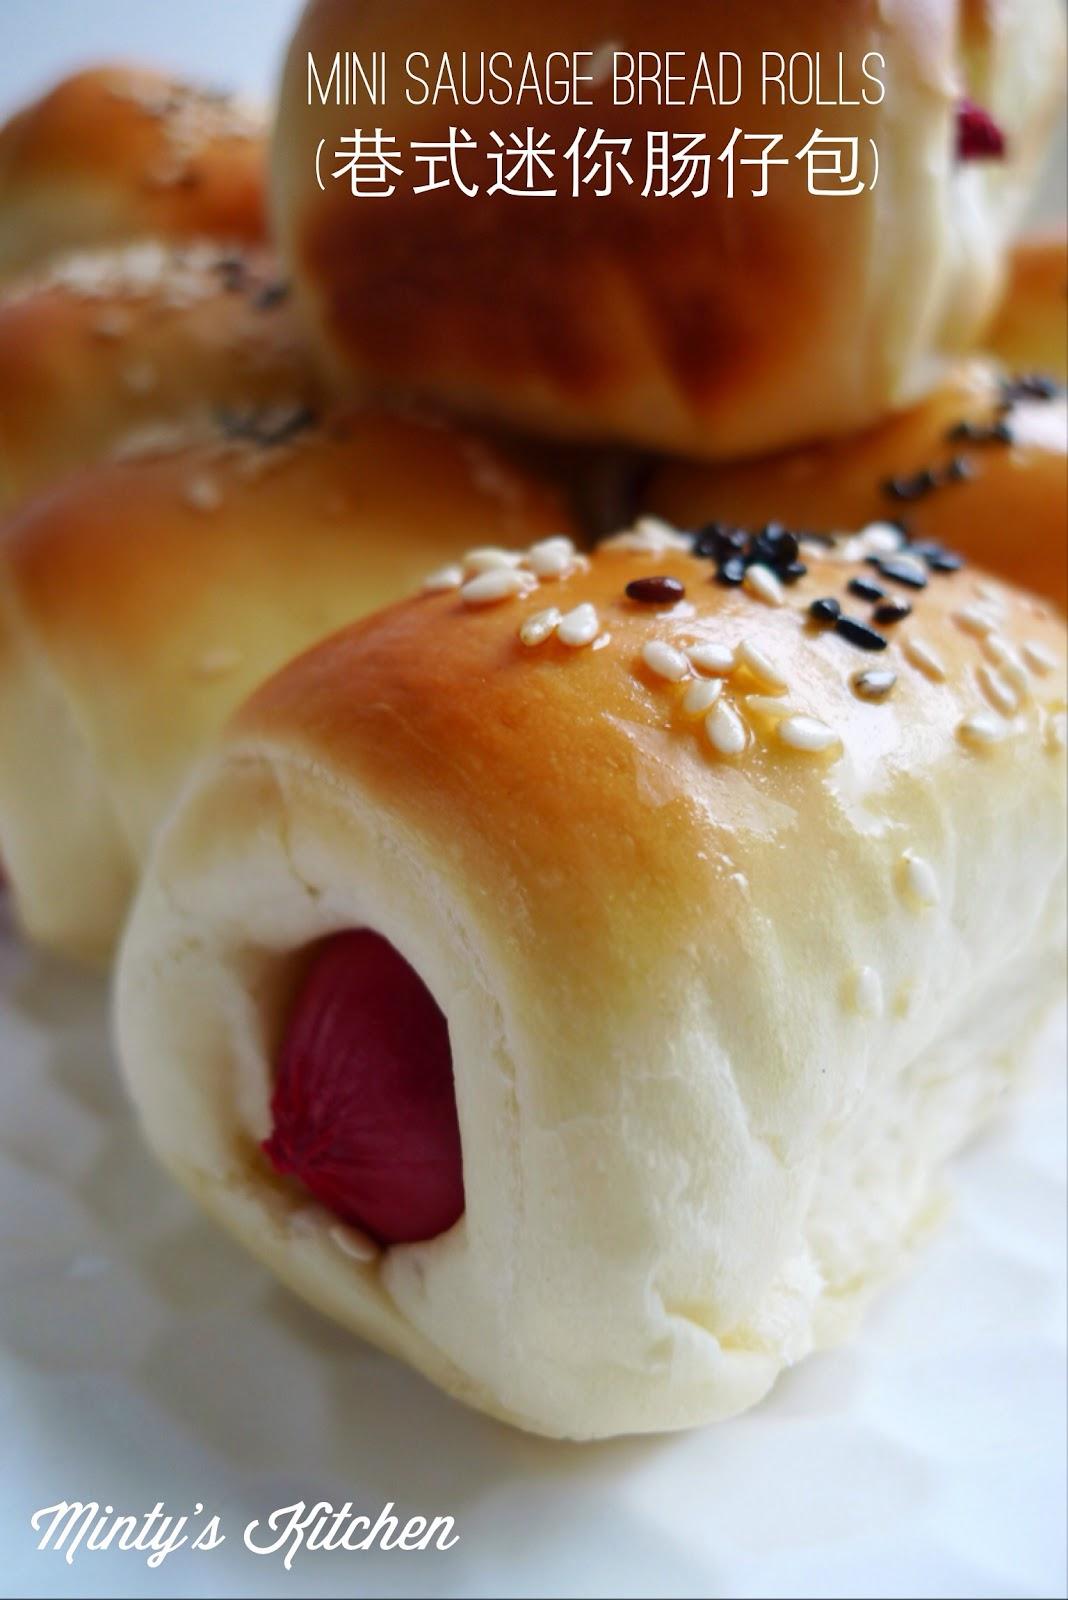 Sausage Rolls / Sausage Bread Rolls